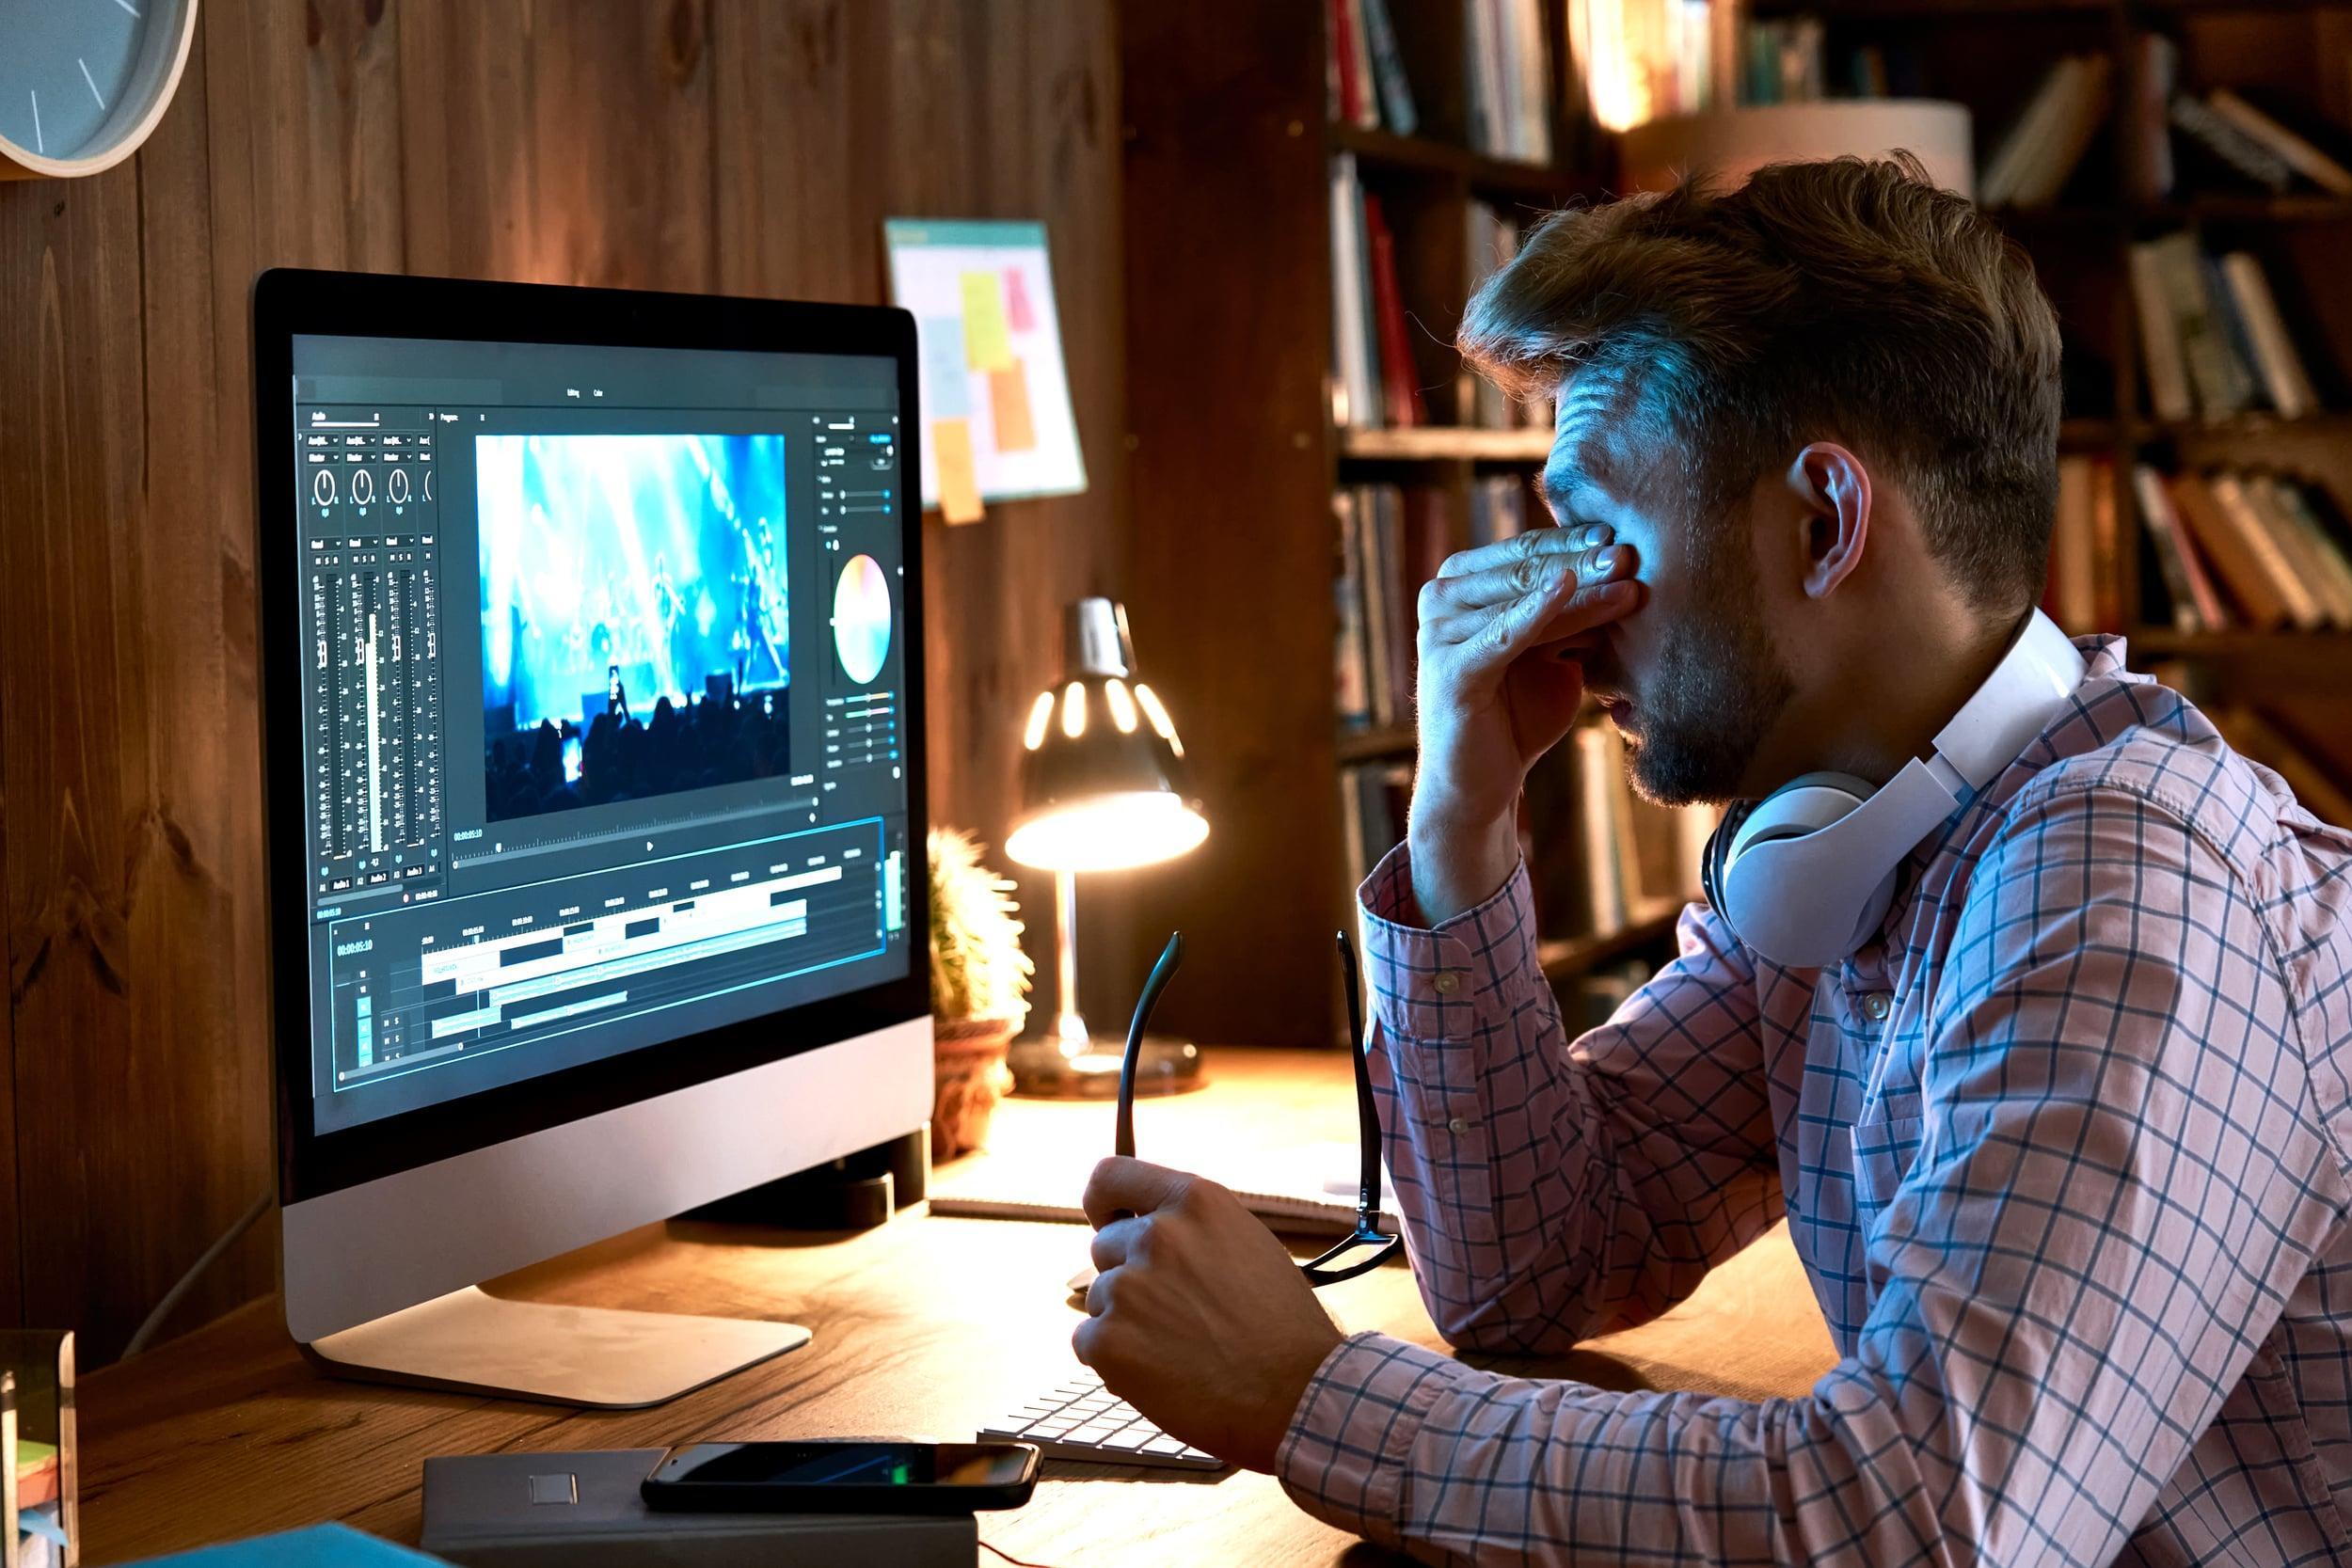 Screen usage and eye pain